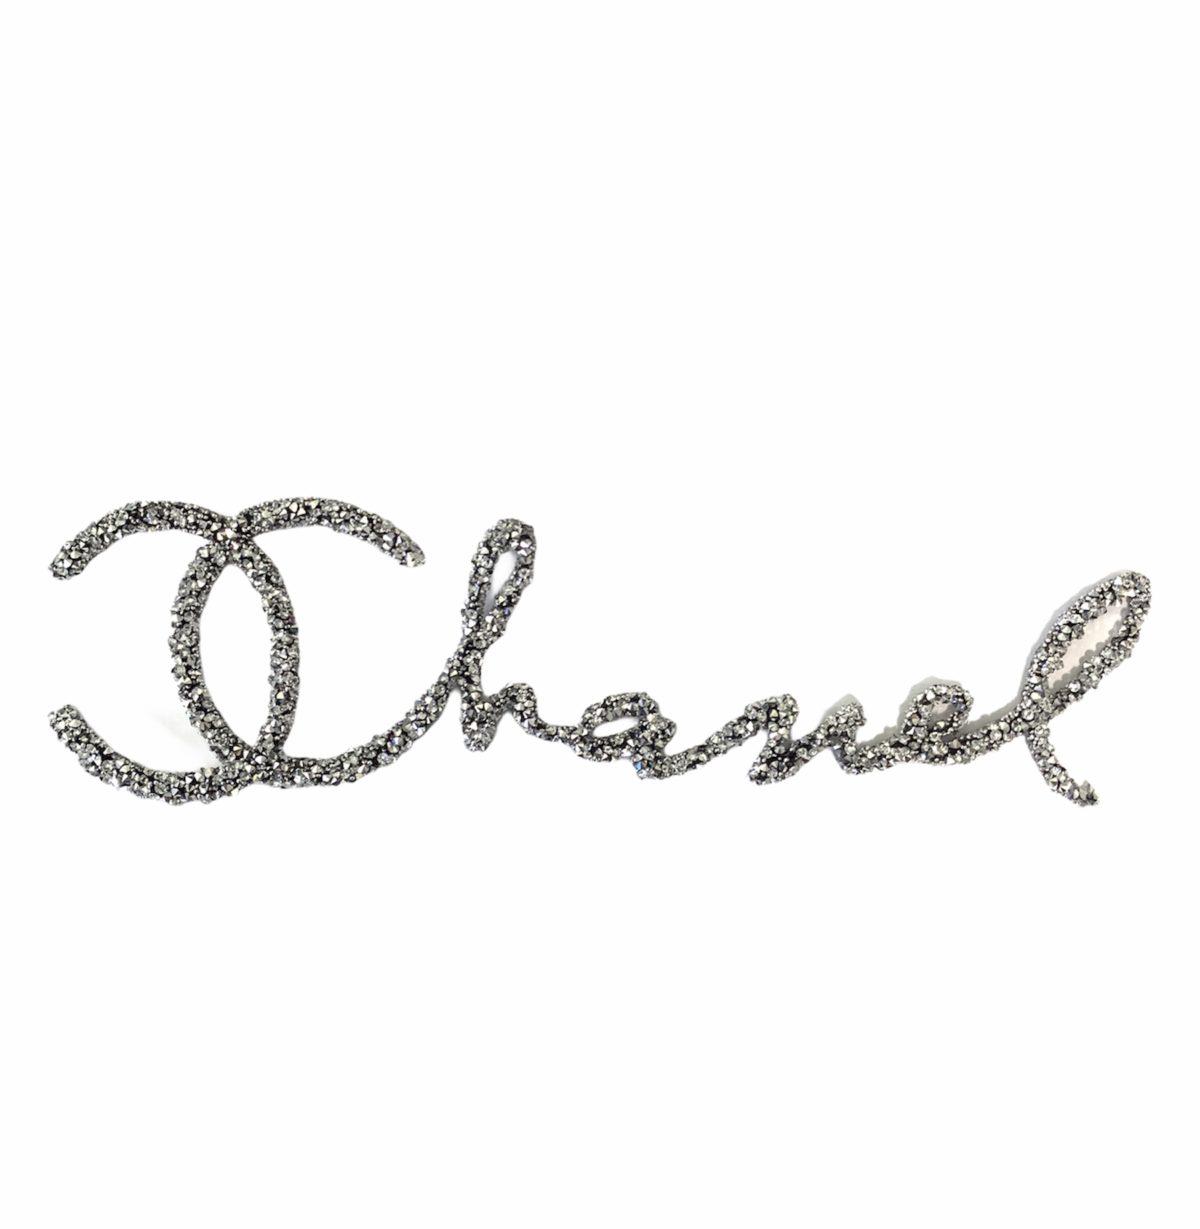 New Chanel Rhinestone Iron on Emblem Patch (Silver) 1